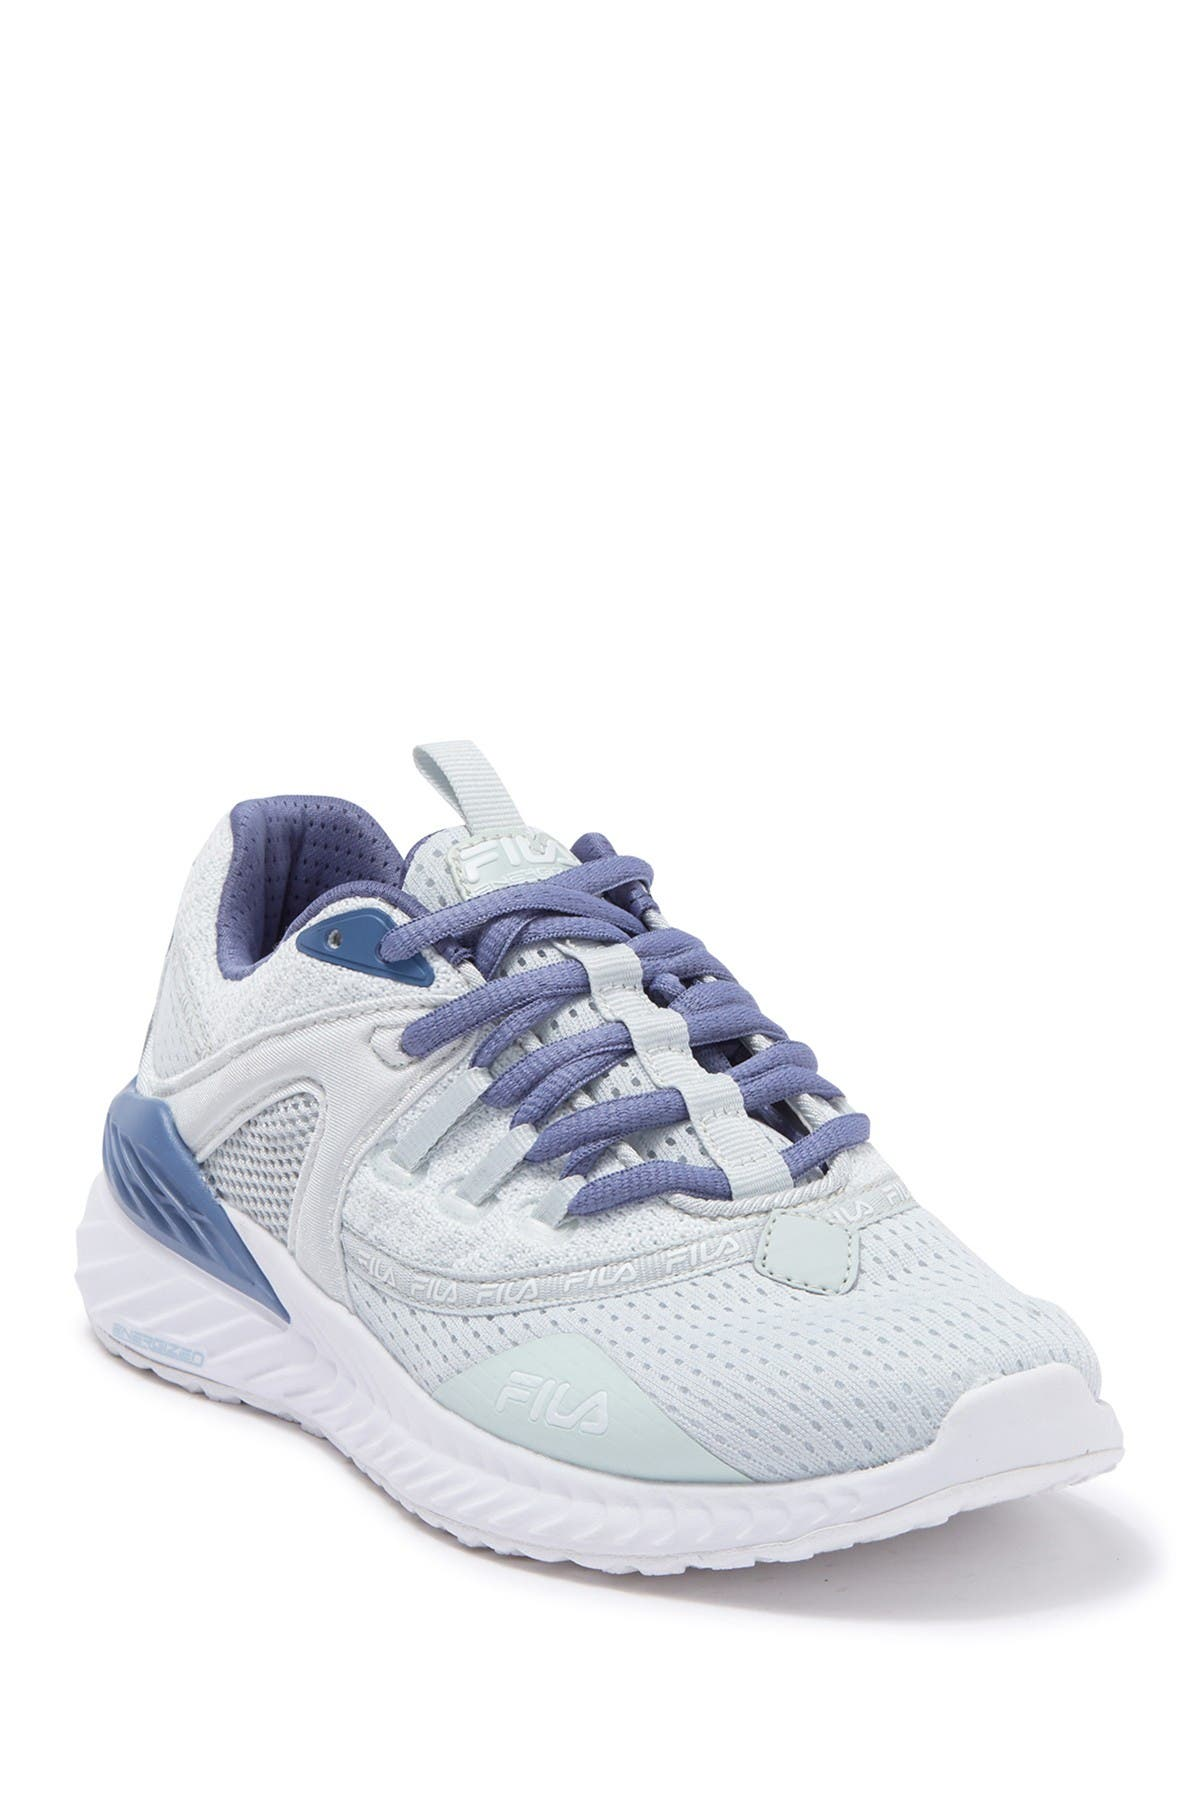 Image of FILA USA Rapidflash 5 Energized Sneaker